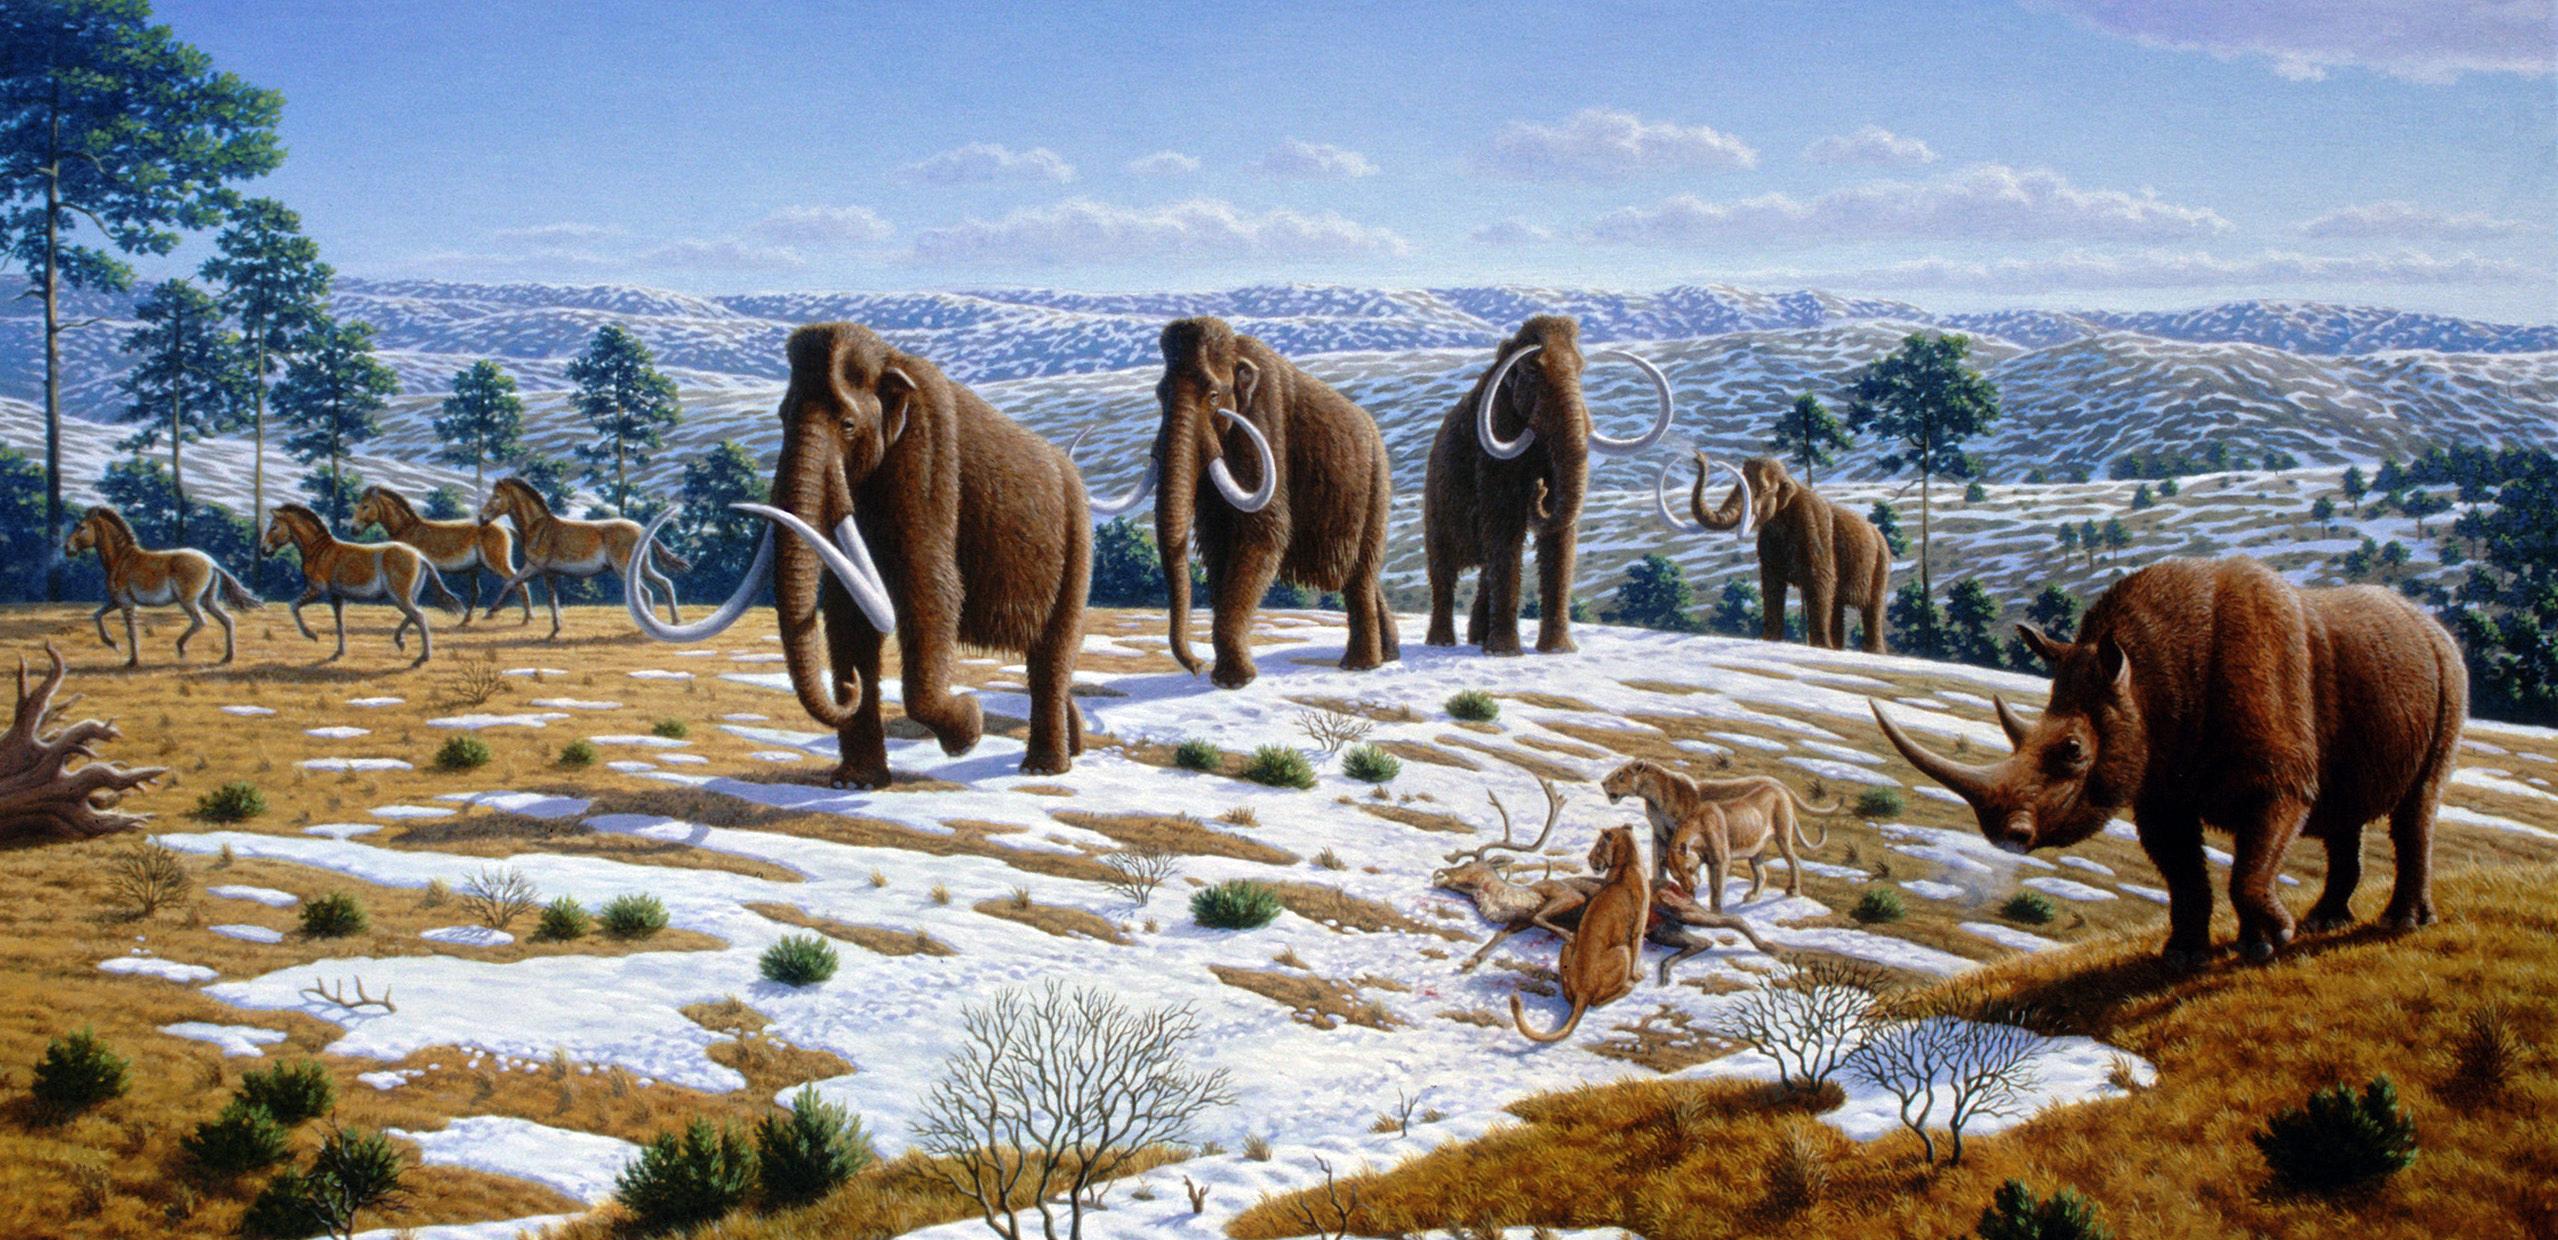 ice_age_fauna_of_northern_spain_-_mauricio_anton.jpg